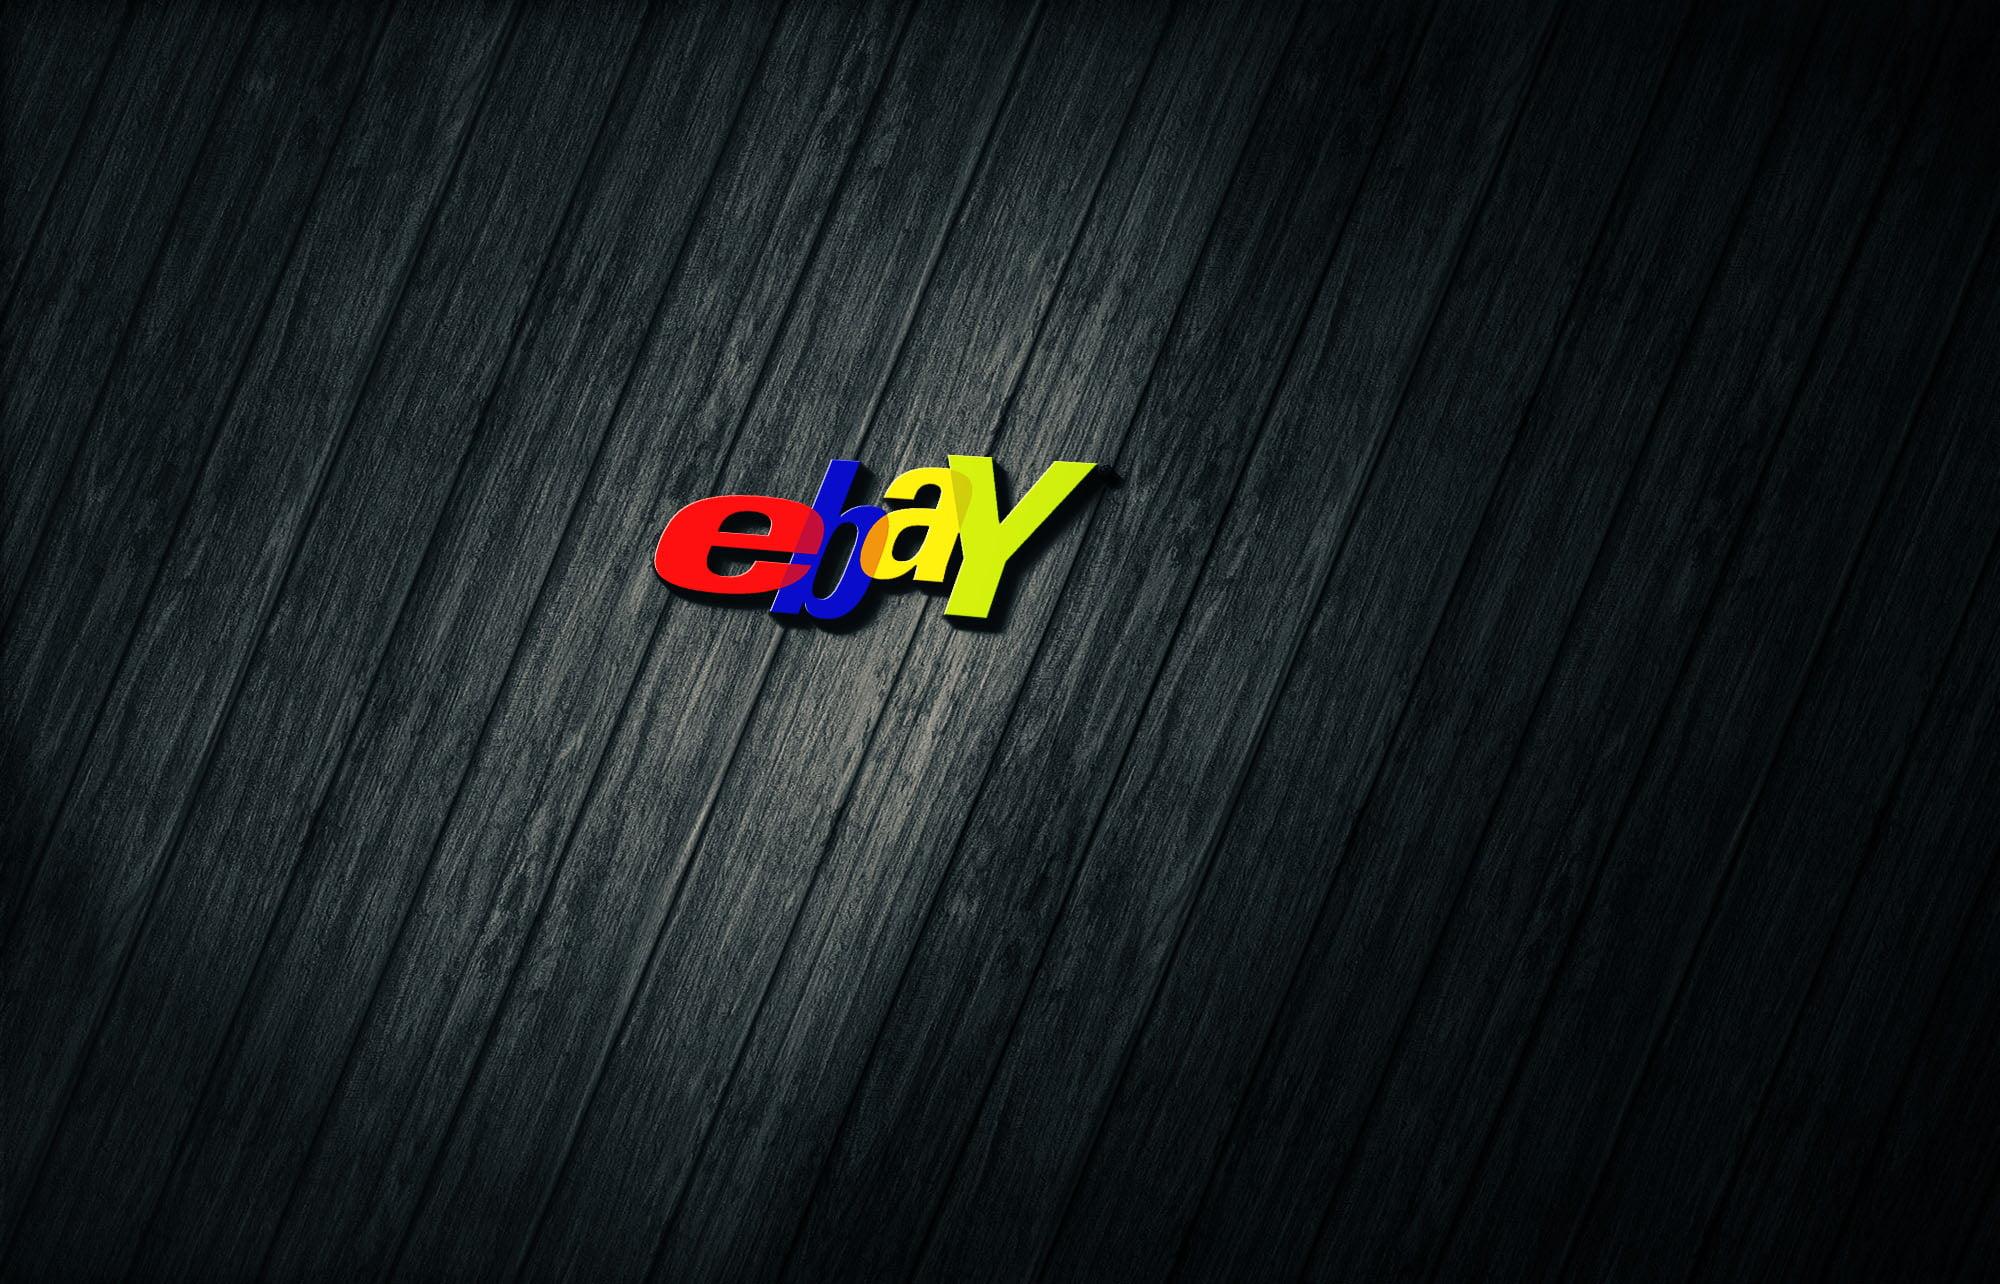 Ebay on 3d dark wood mockup